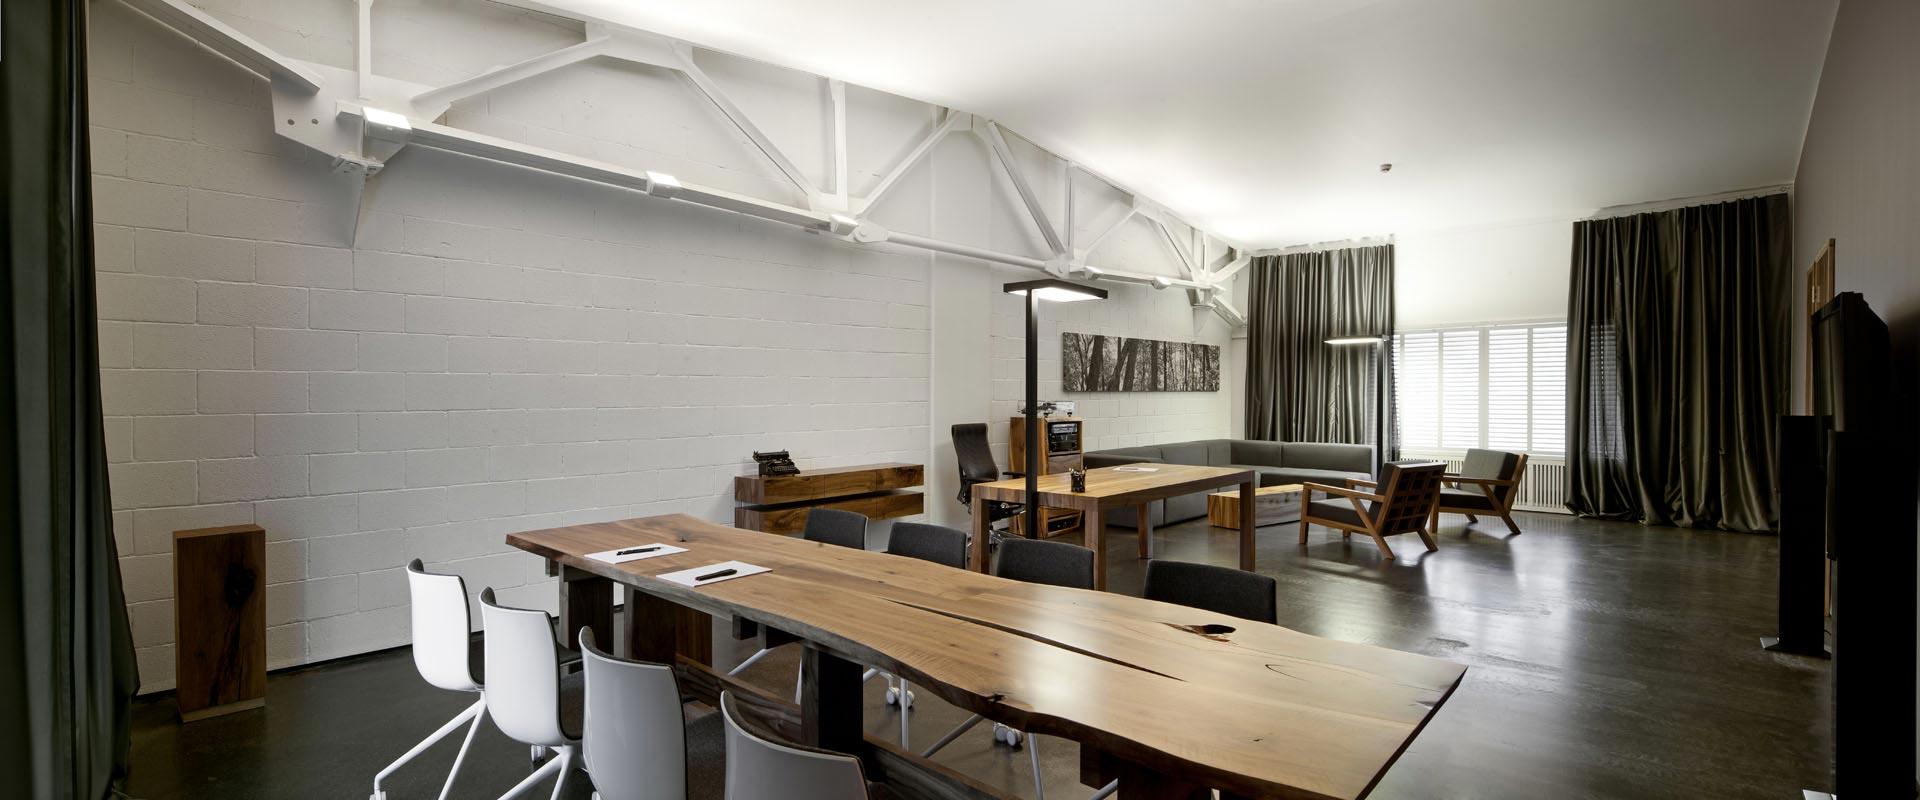 office industerial design - طراحی داخلی صنعتی